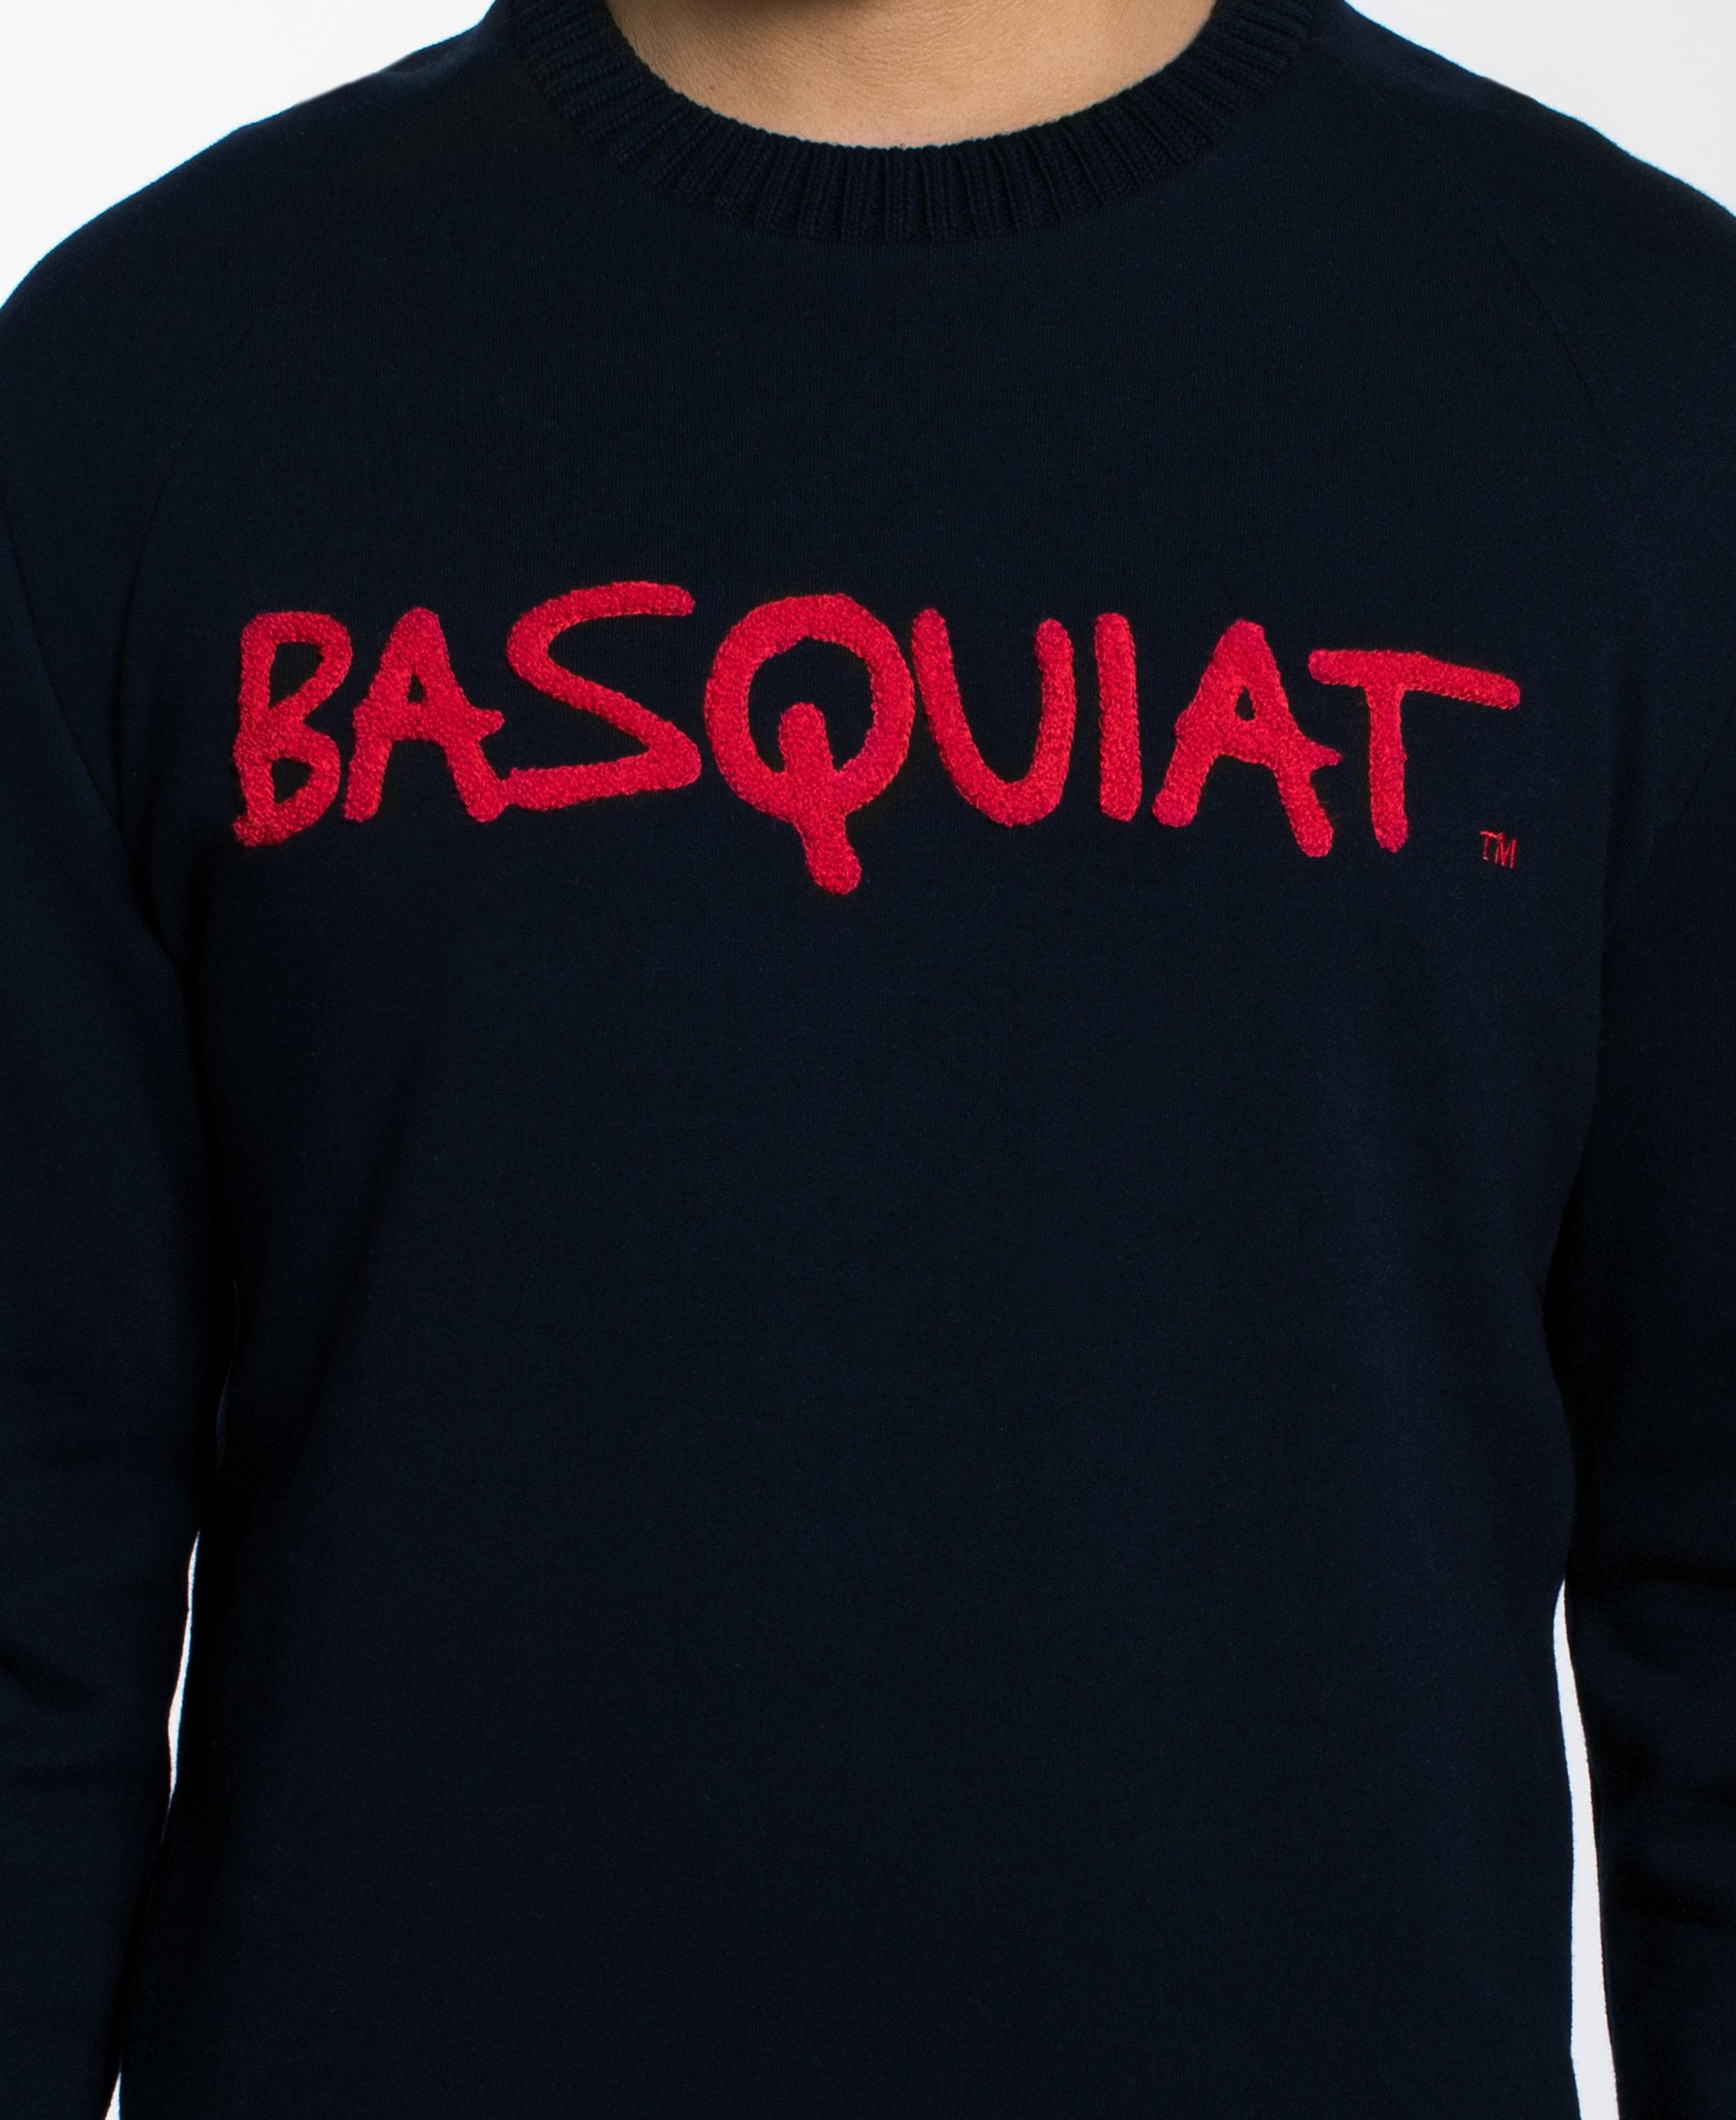 Basquiat Solid Chenille Sweatshirt Upclose.jpg